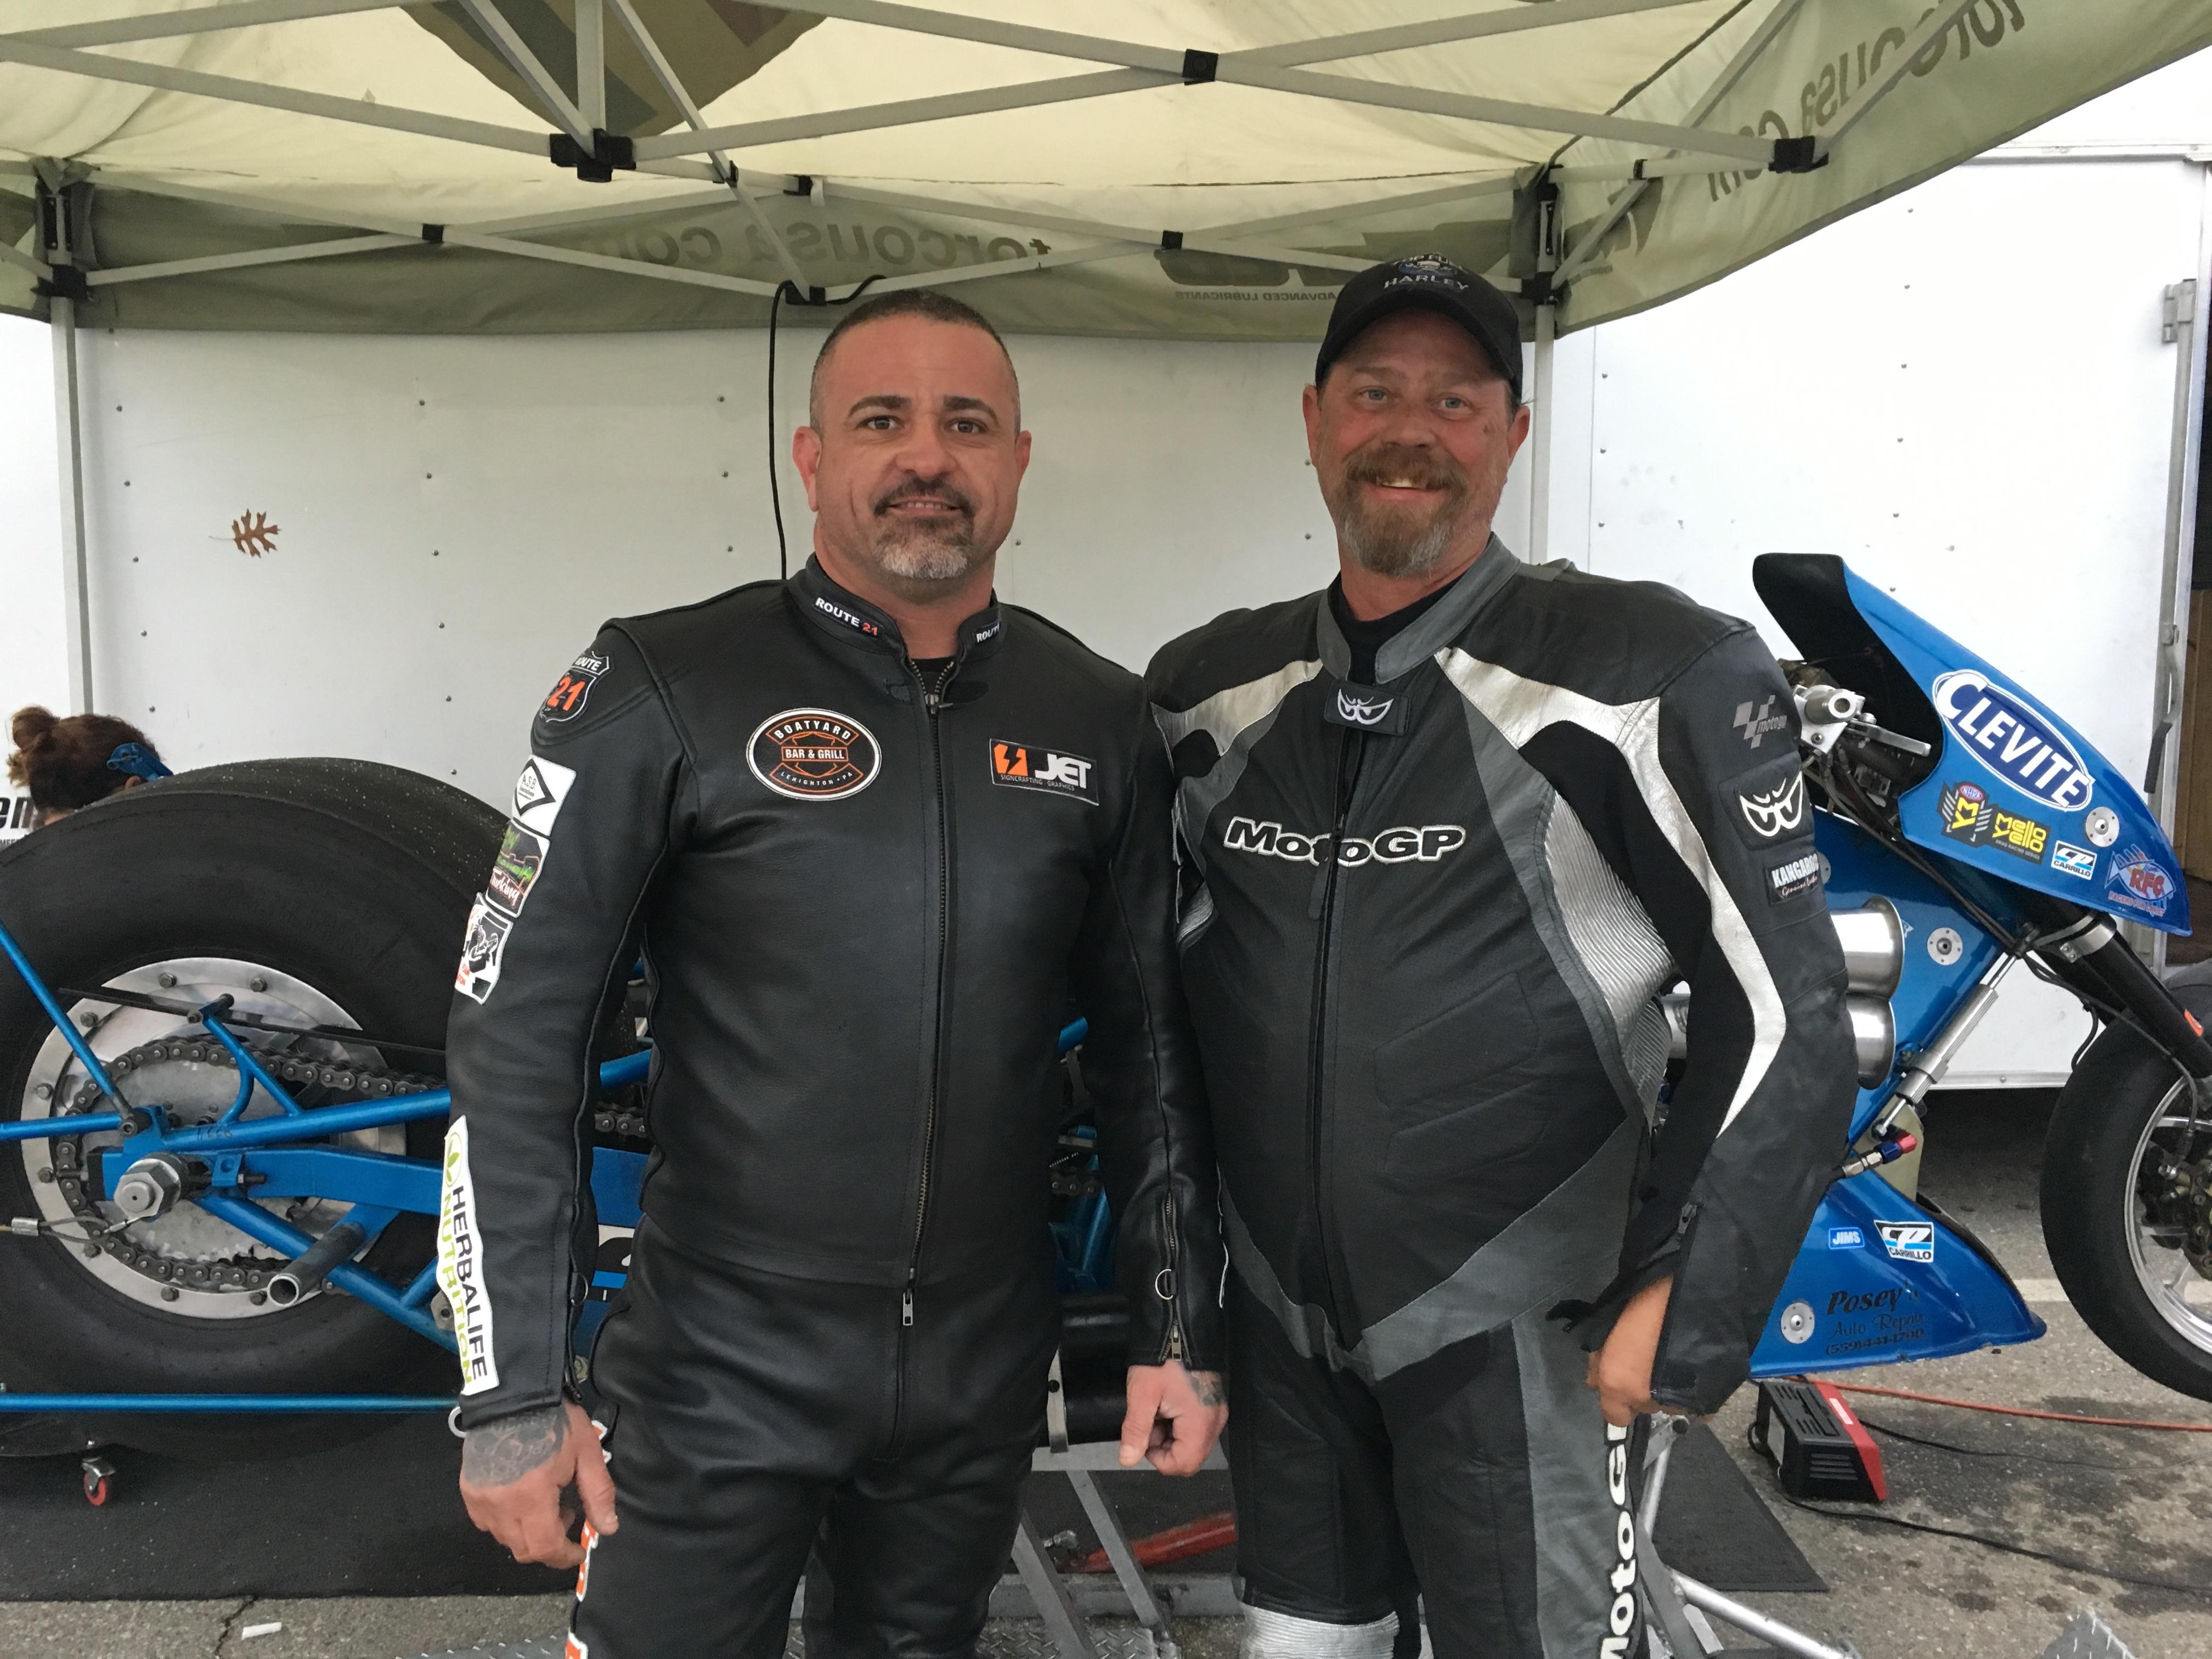 Michael Balch and Scott Oakley